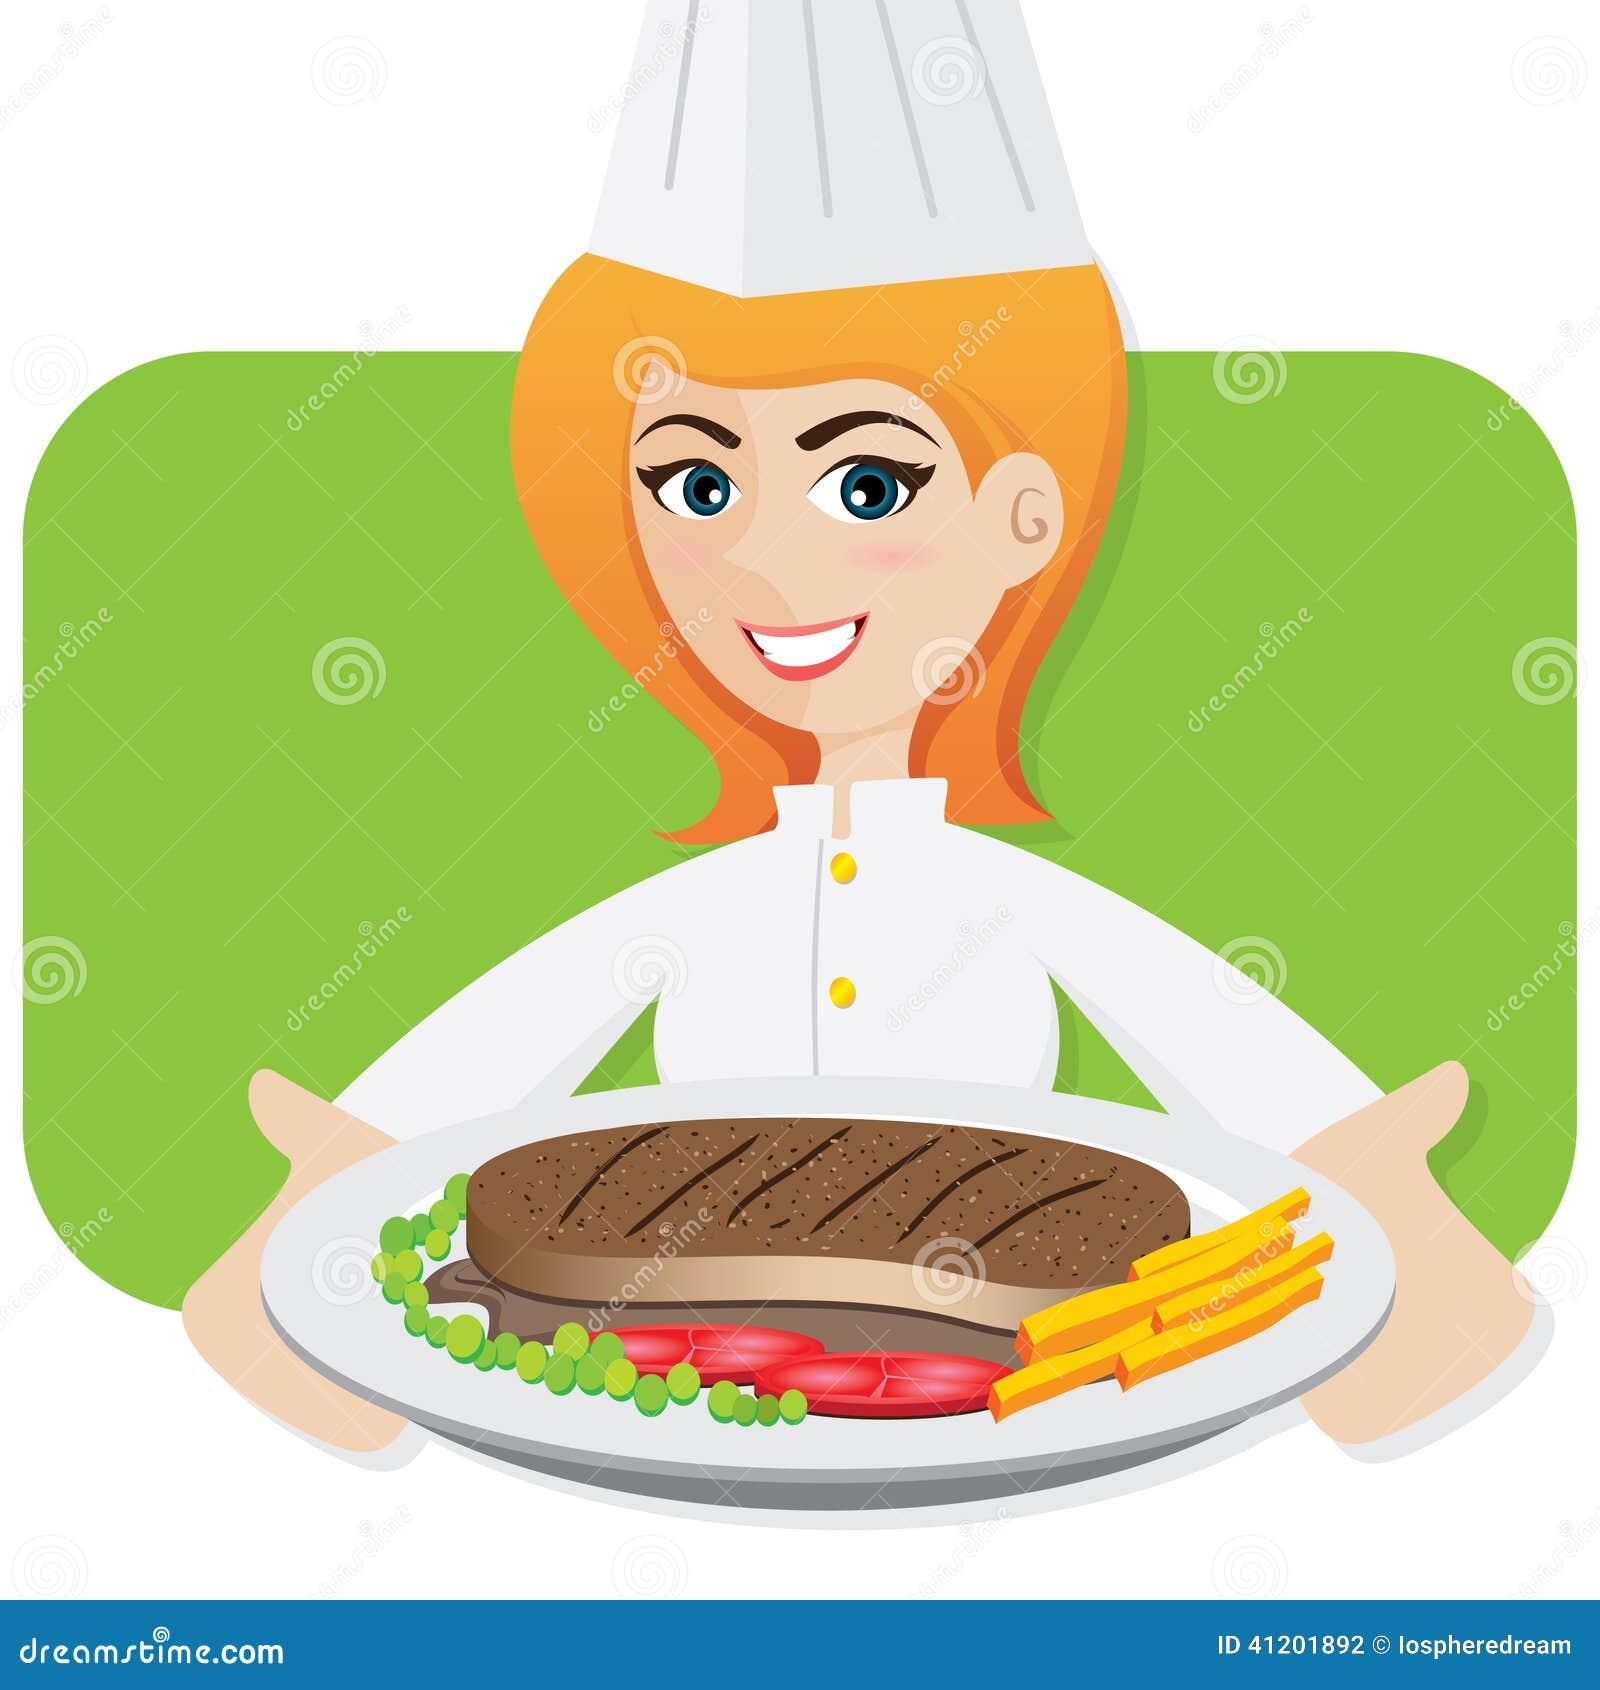 Cartoon Girl Chef Serving Steak Illustration Of Stock Photography